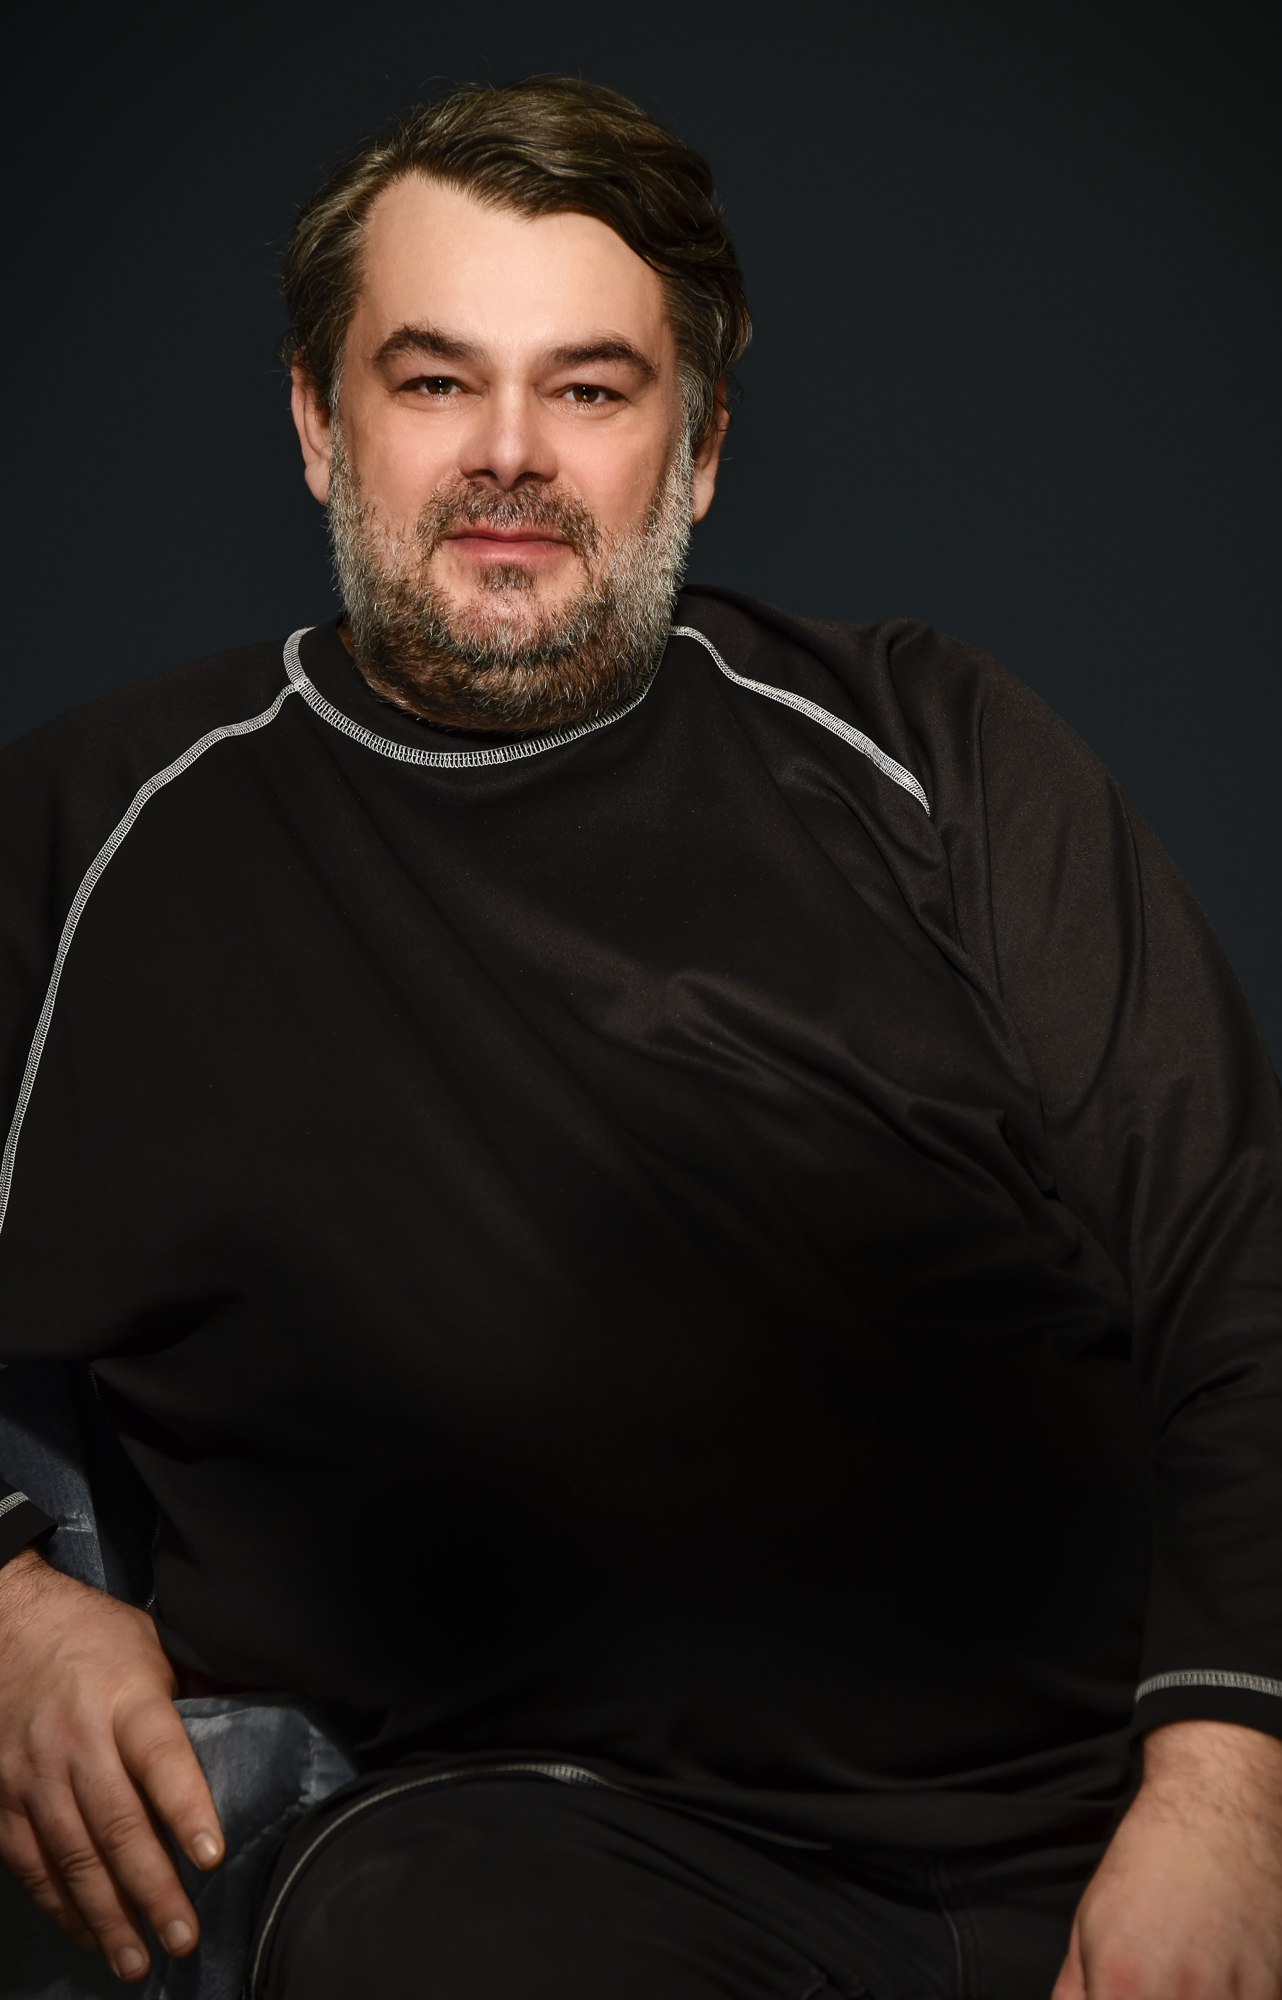 Petr Schuster